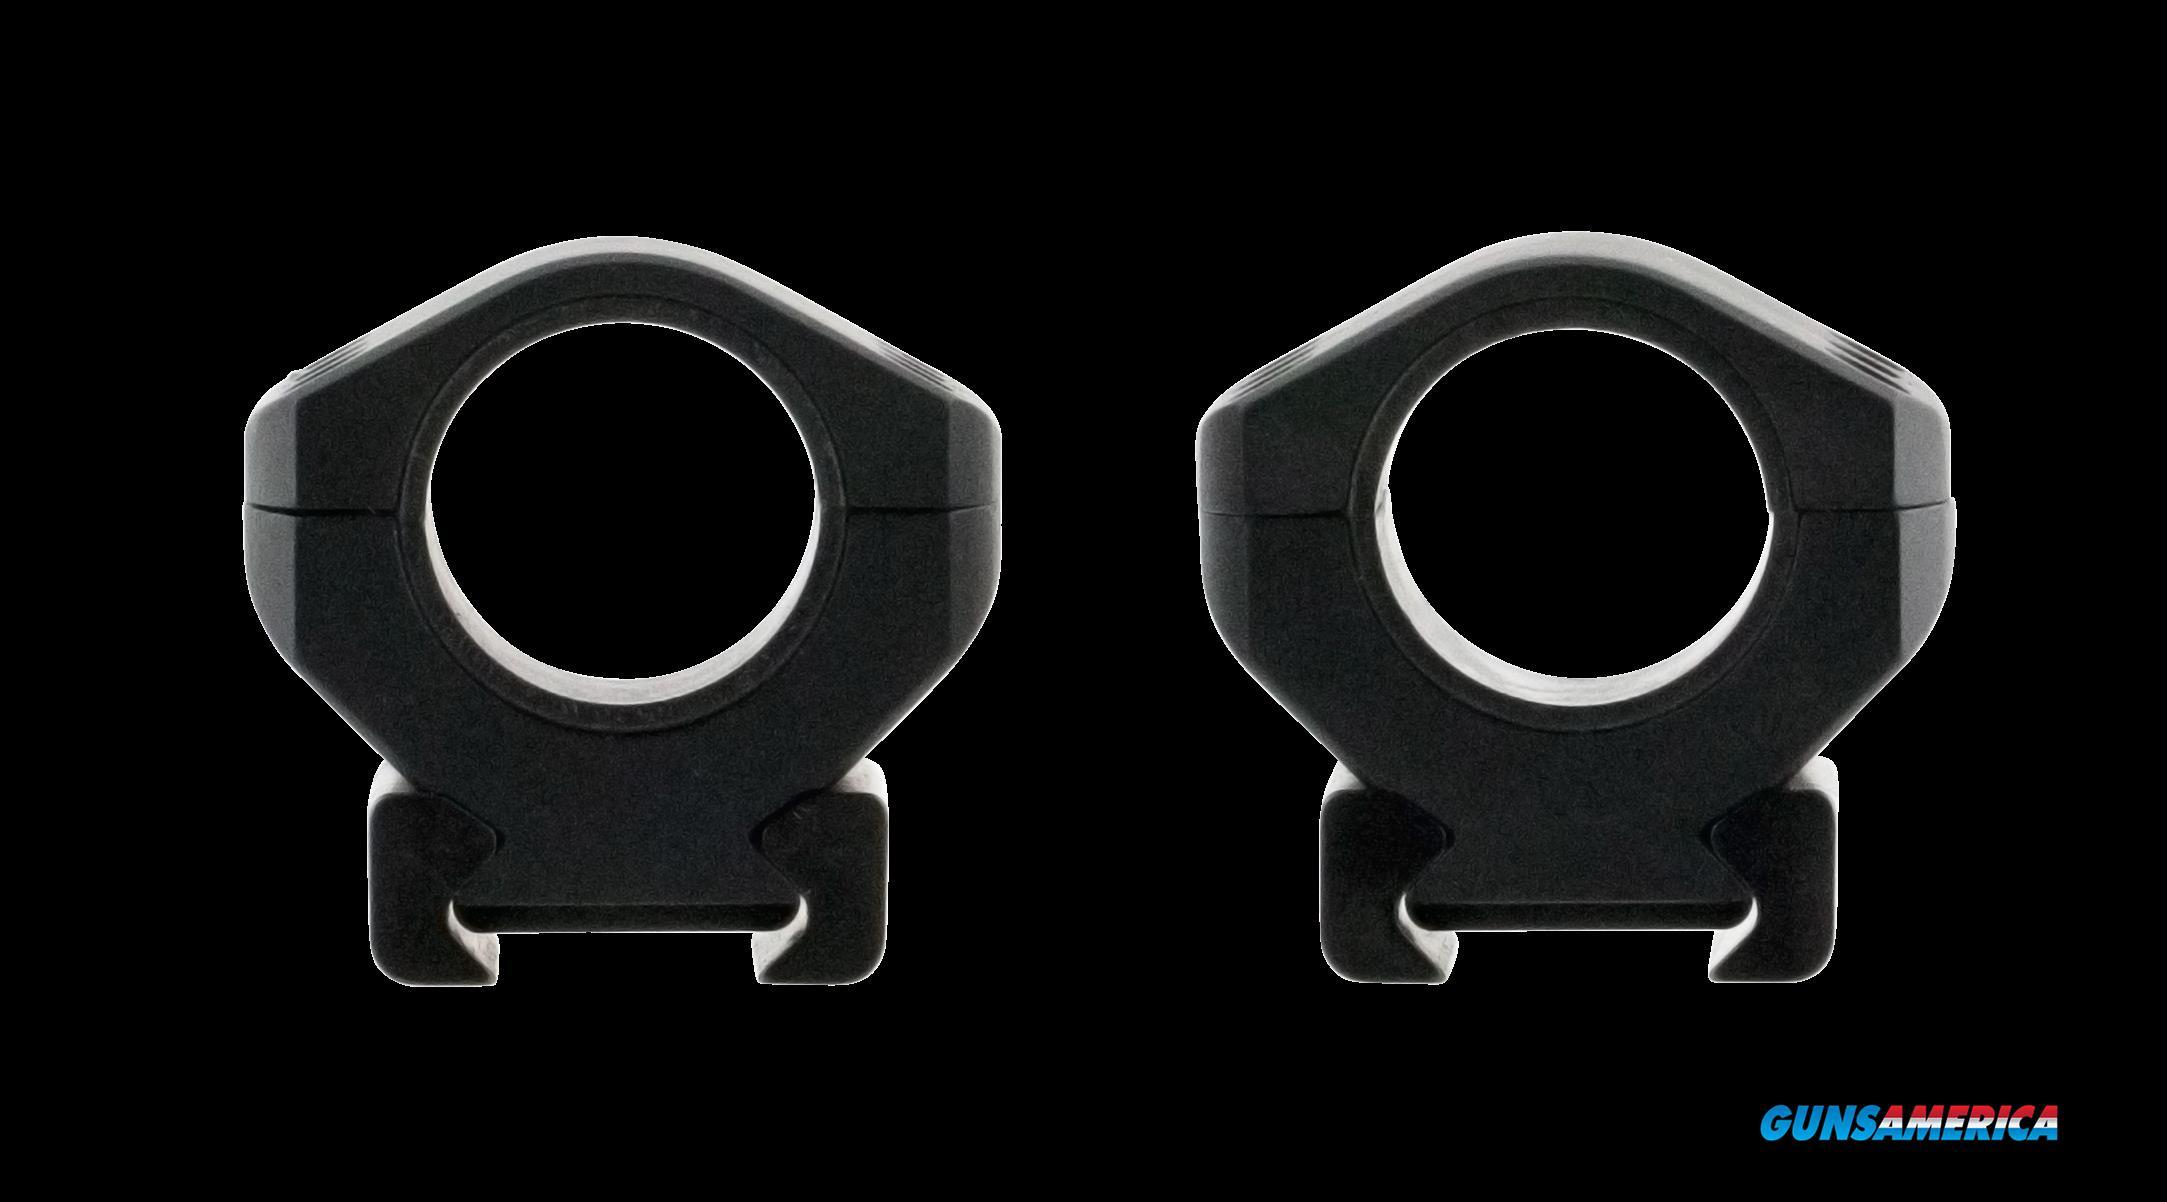 Burris Xtr, Bur 420231 Xtr Sig Rings 1.00      Mat  Guns > Pistols > 1911 Pistol Copies (non-Colt)